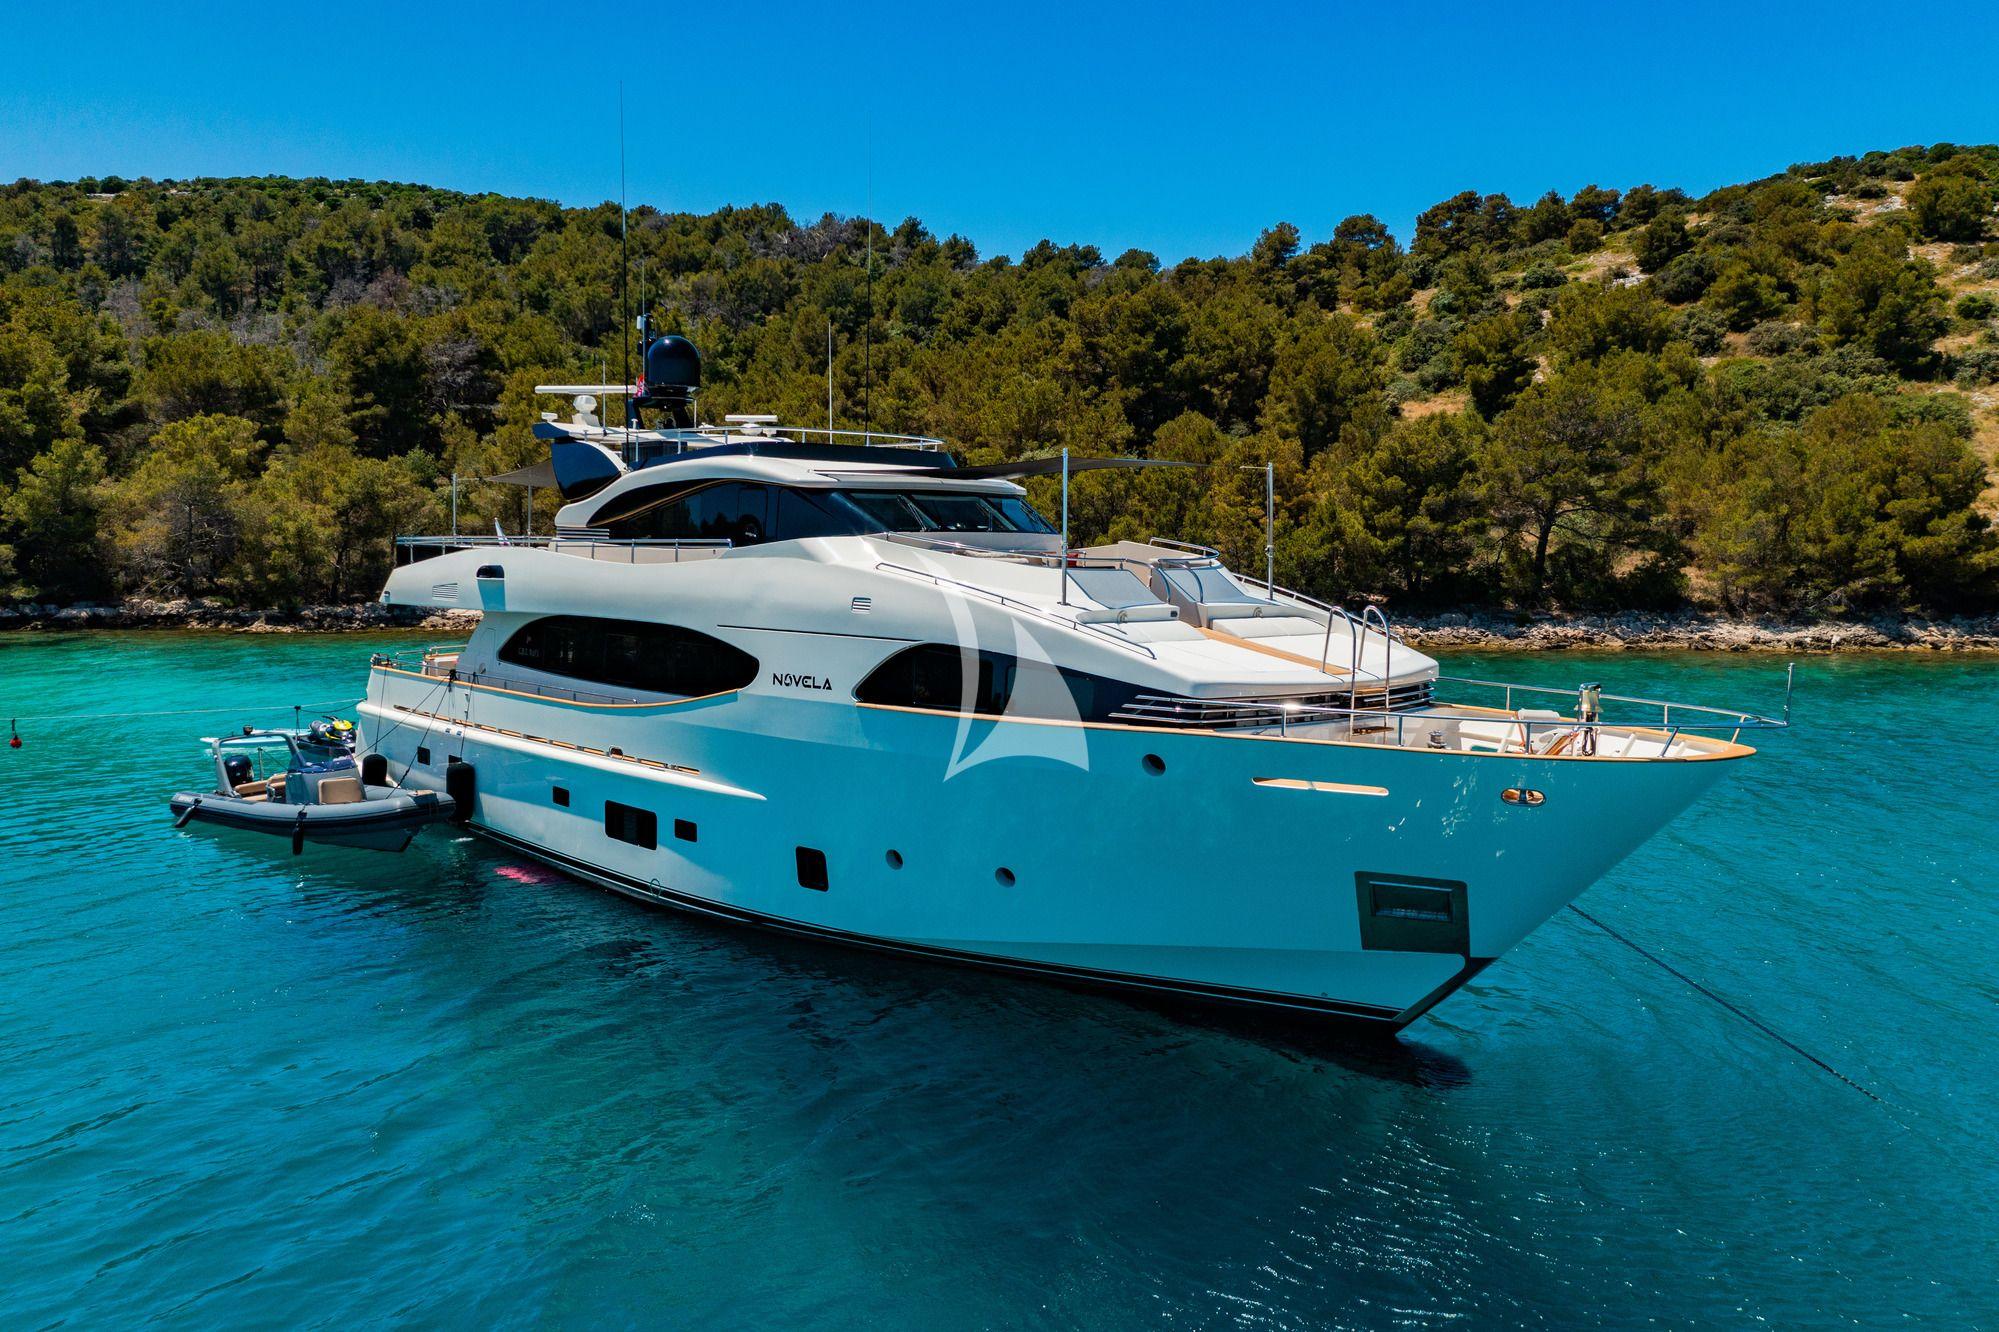 NOVELA - 30m CBI Navi - 4 Cabins - Trogir - Split - Dubrovnik - Hvar - Kotor - Tivat - Budva